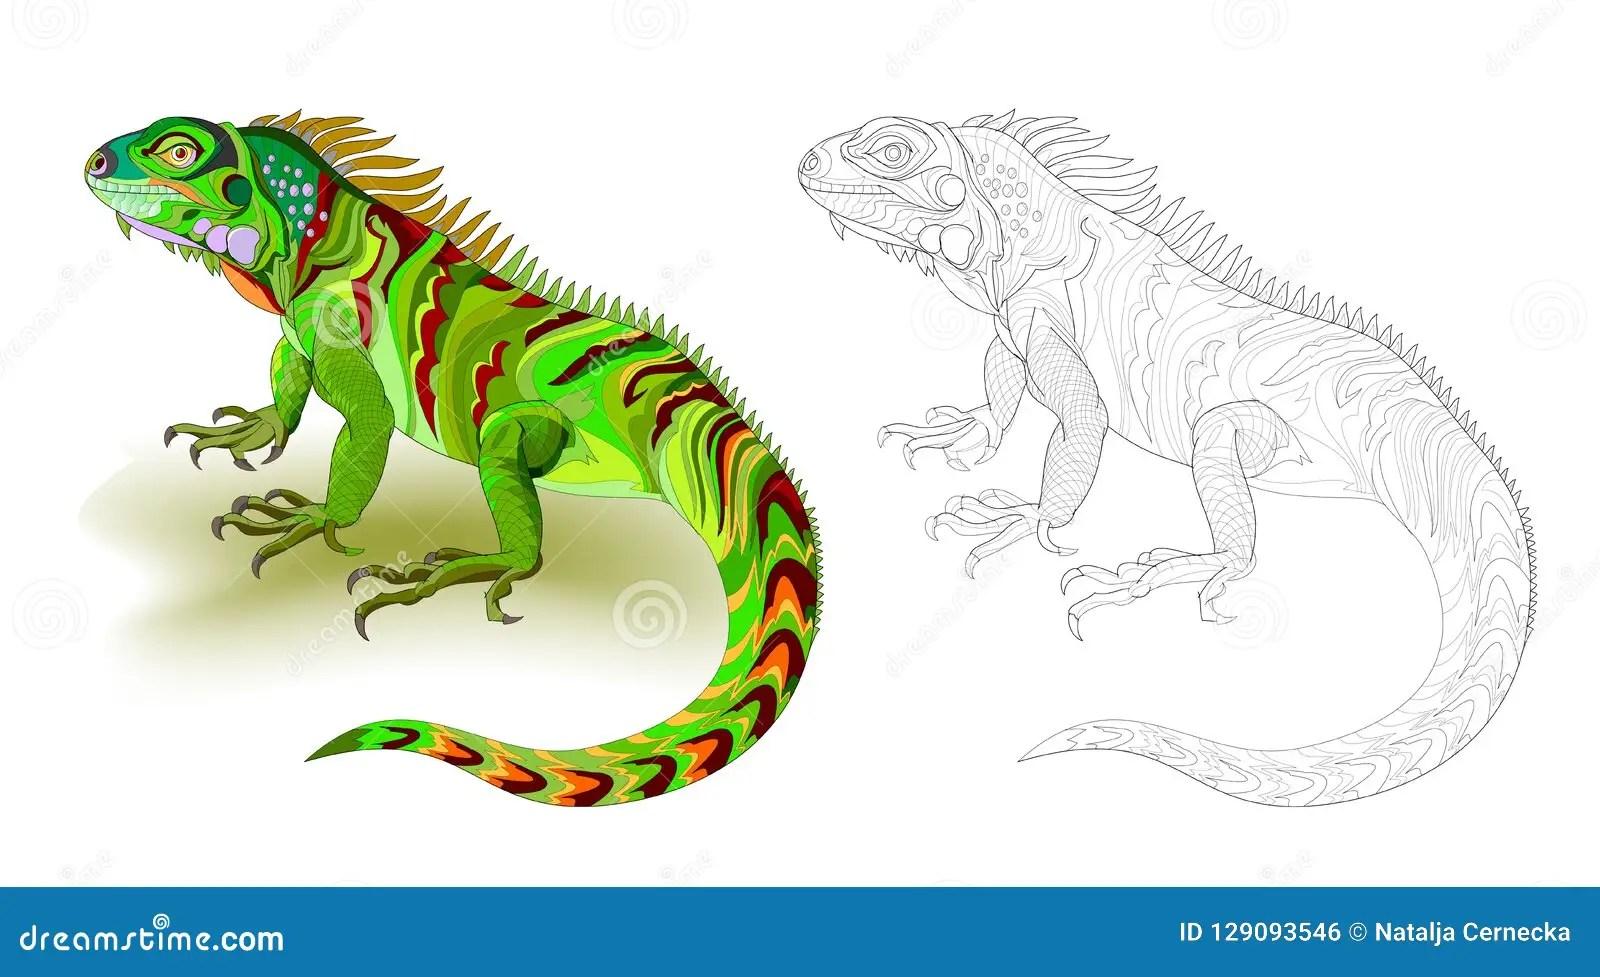 Cartoon Iguana Coloring Book Vector Illustration